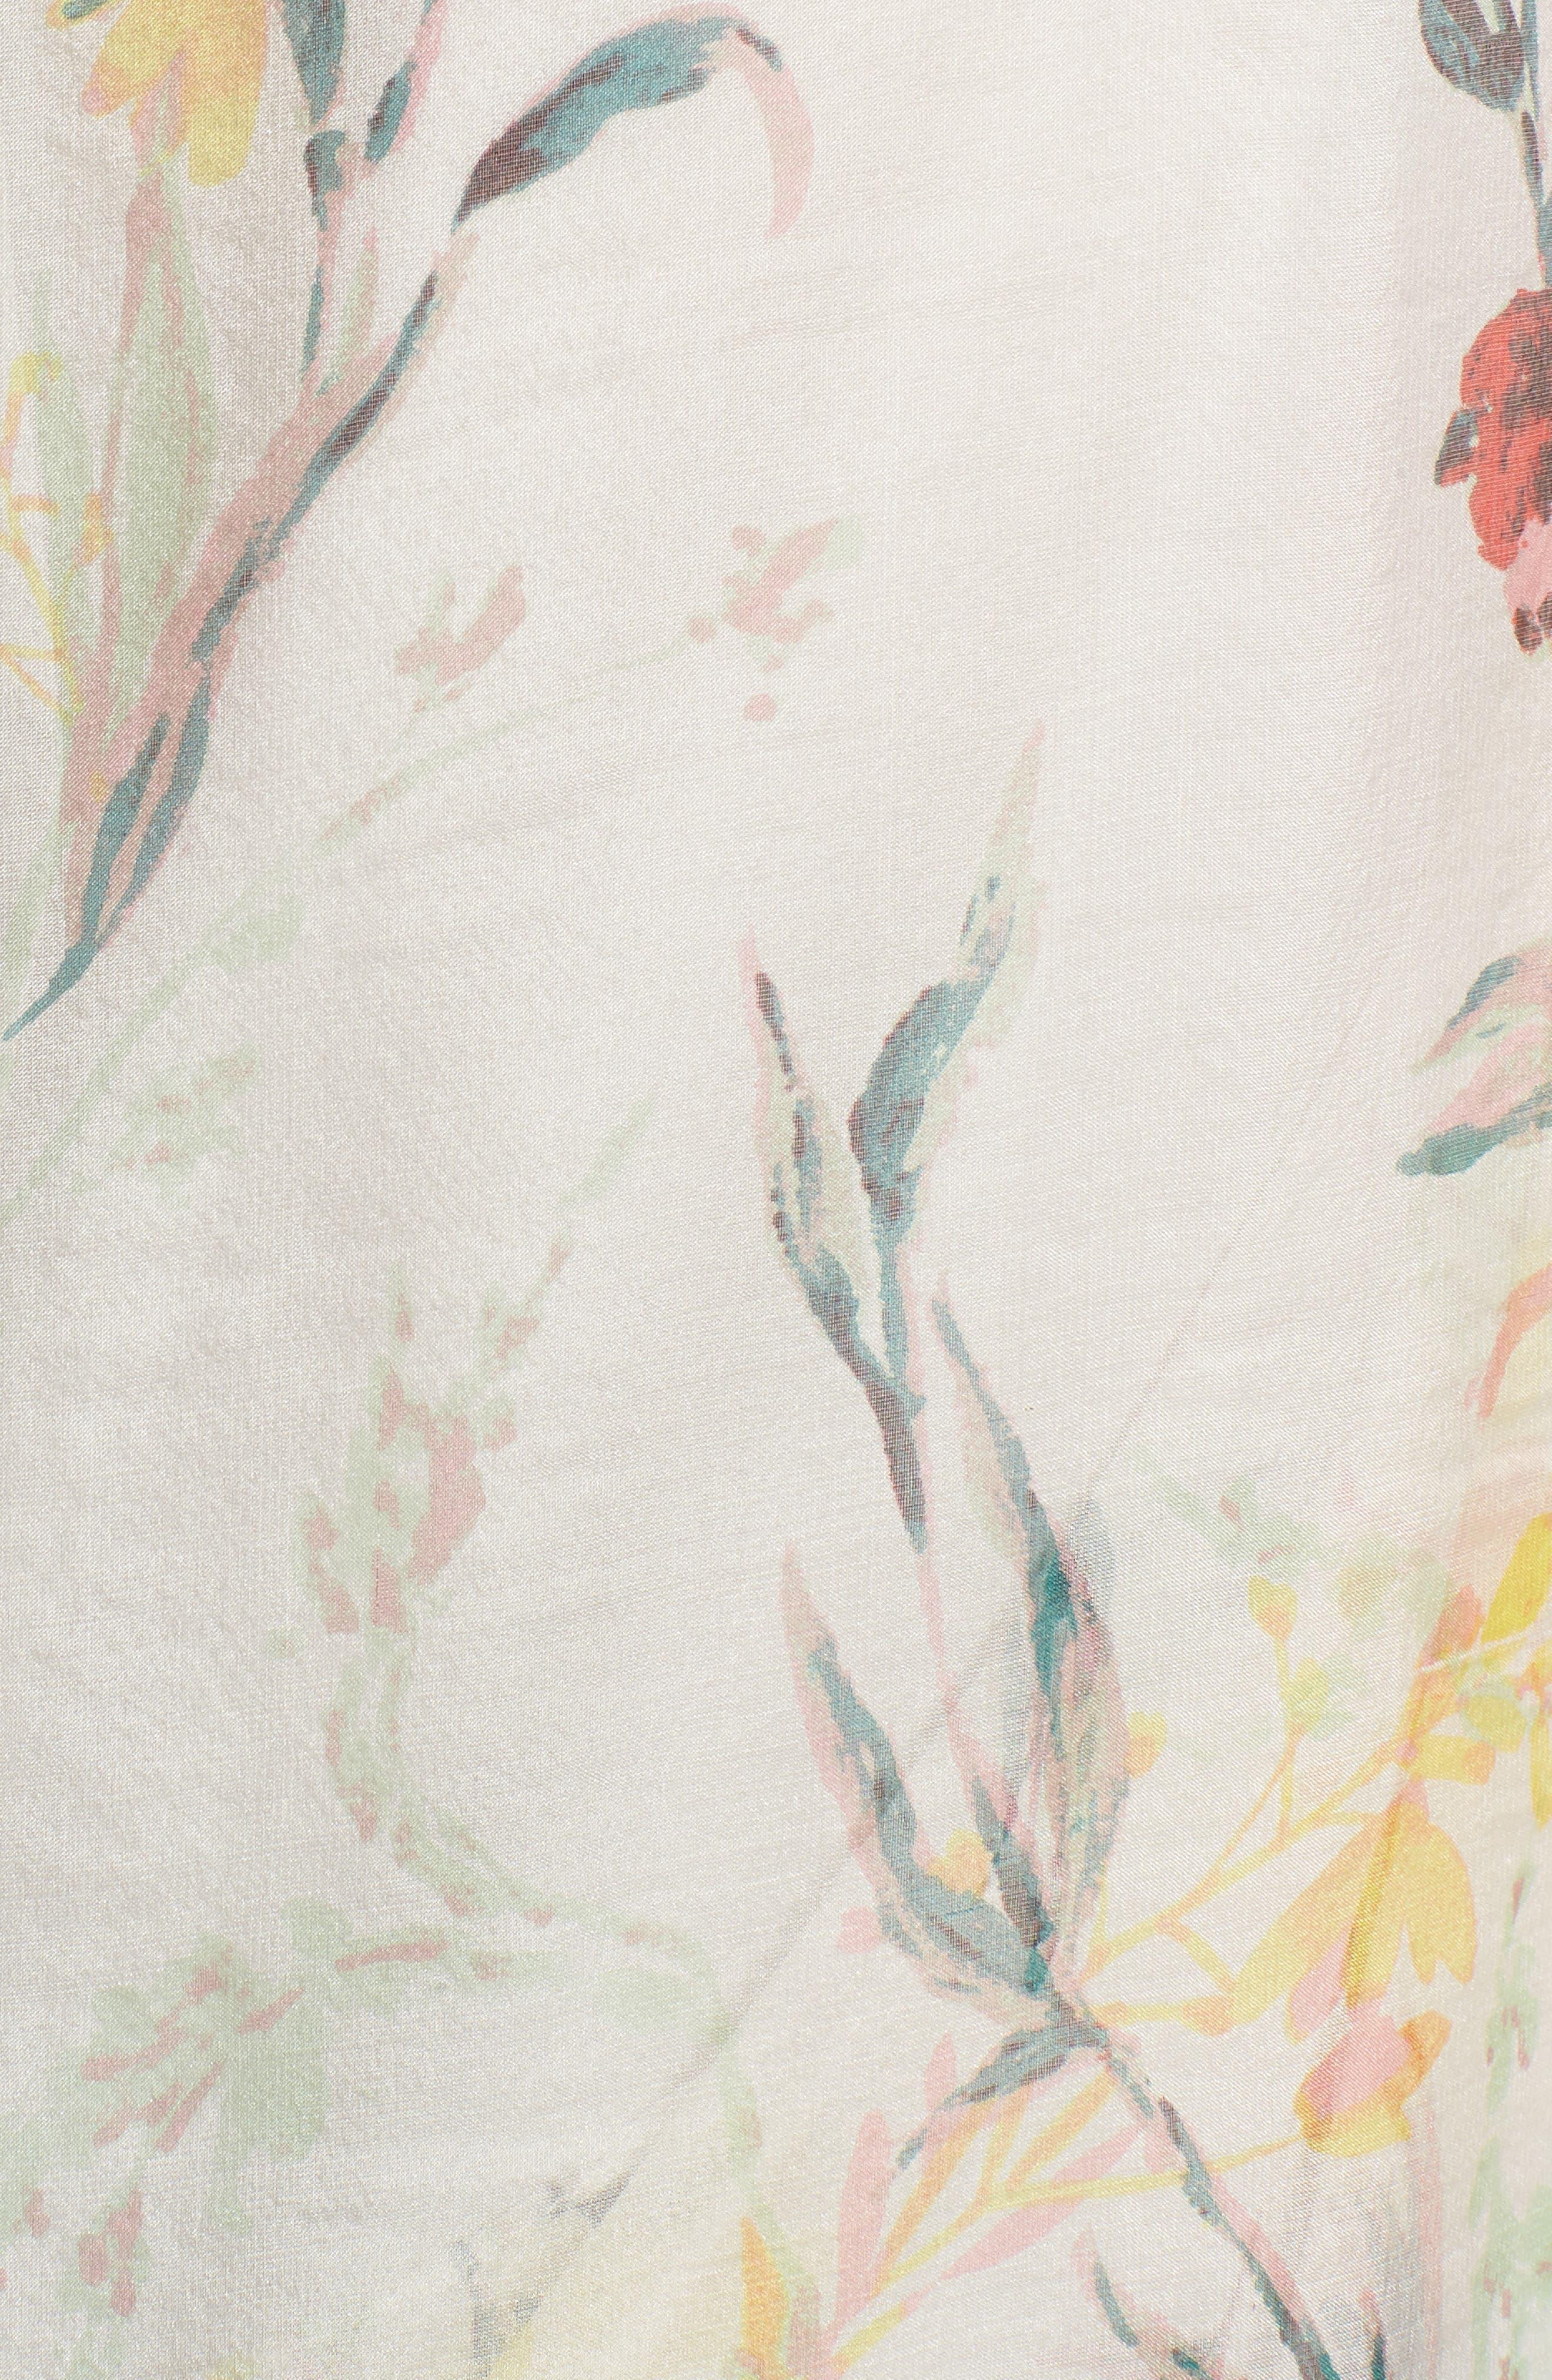 Print Silk Chiffon Oblong Scarf,                             Alternate thumbnail 5, color,                             White Savannah Birds